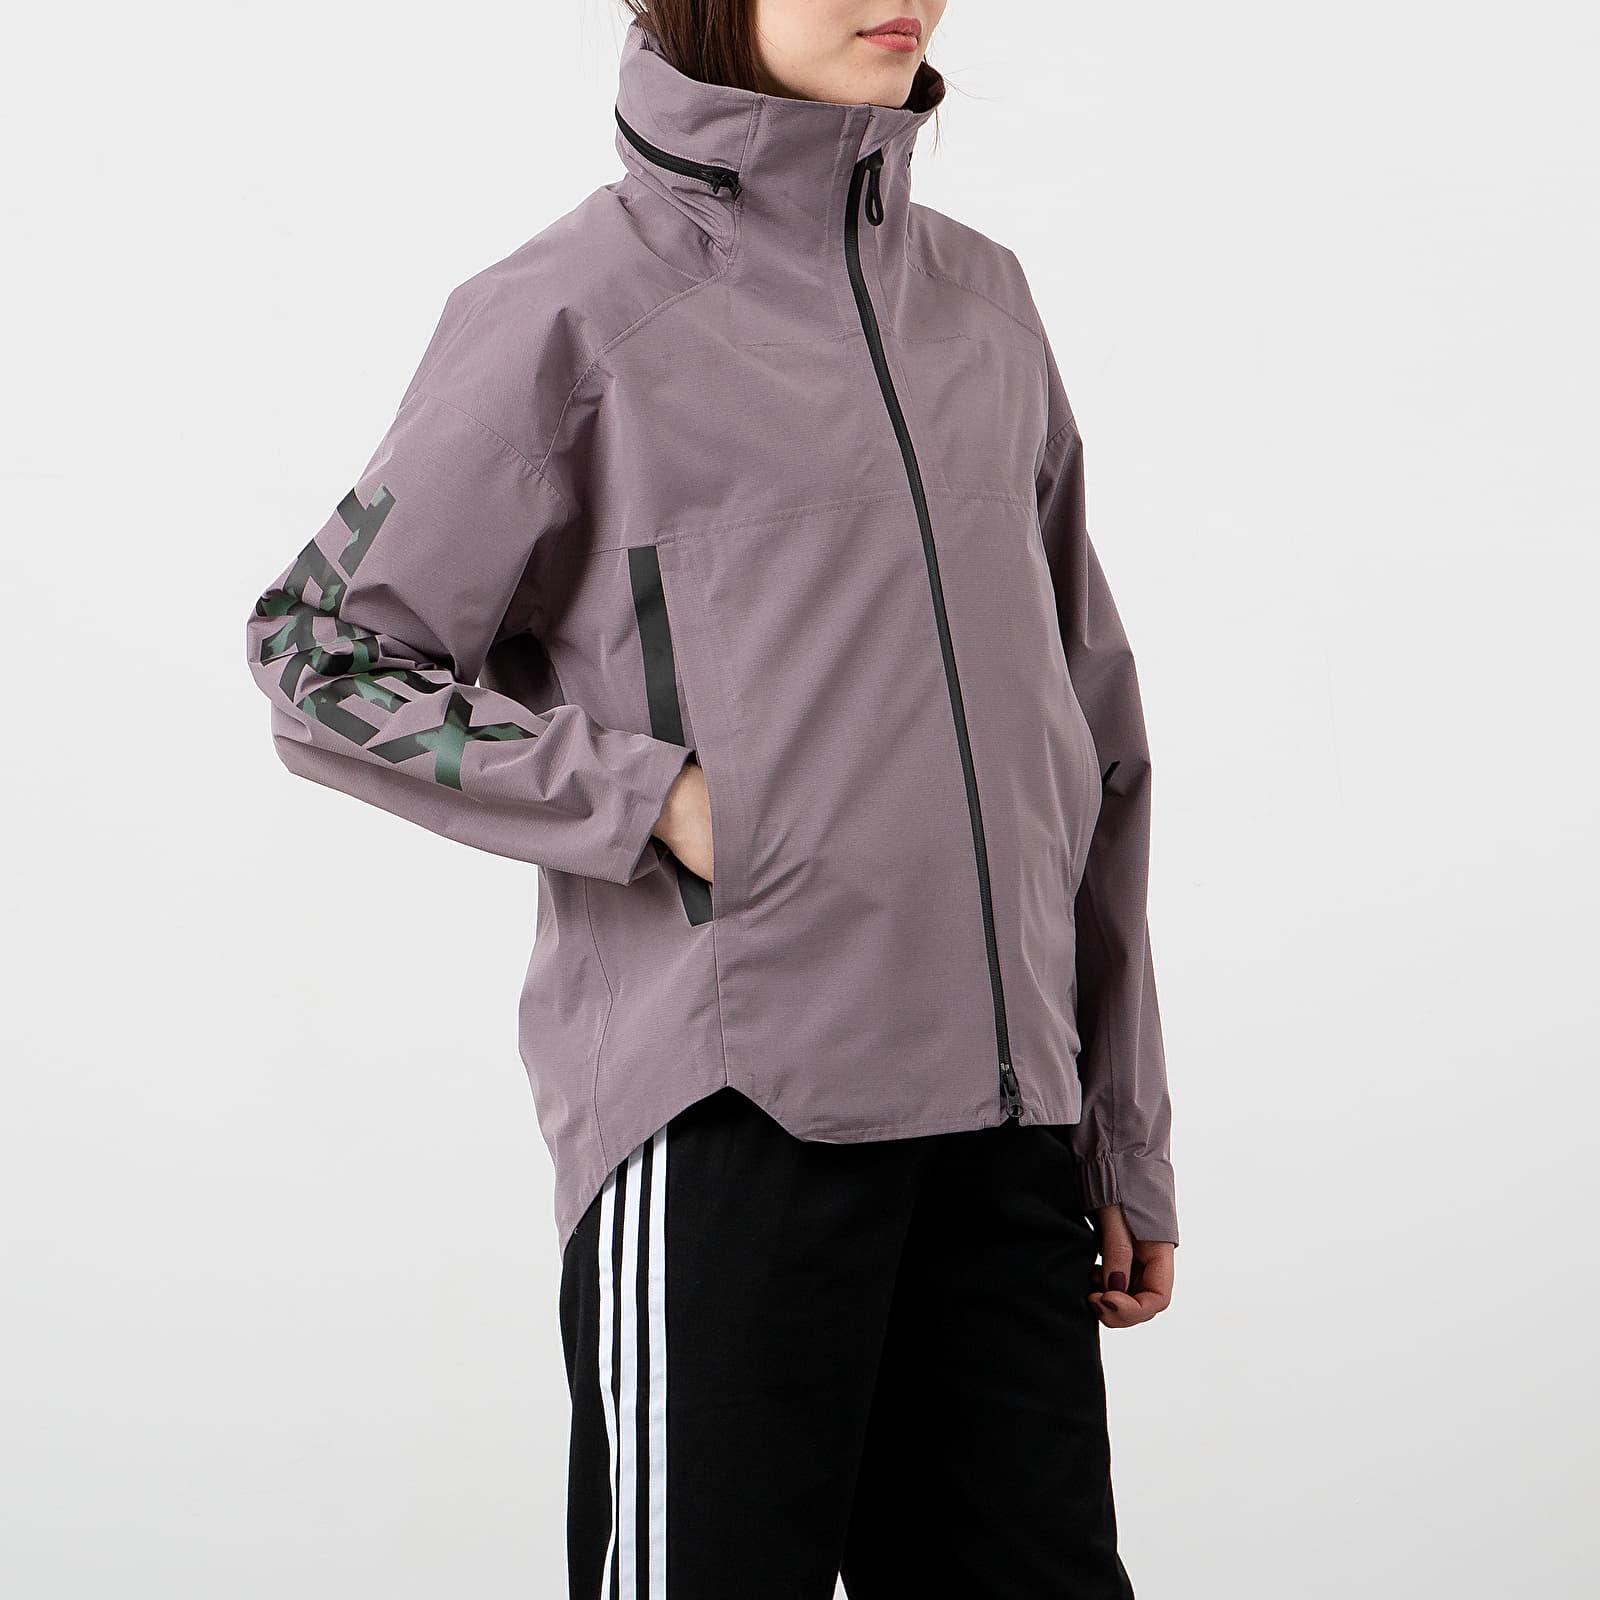 Coach Jackets adidas Terrex Myshelter 3in1 Jacket Legacy Purple/ Multicolor